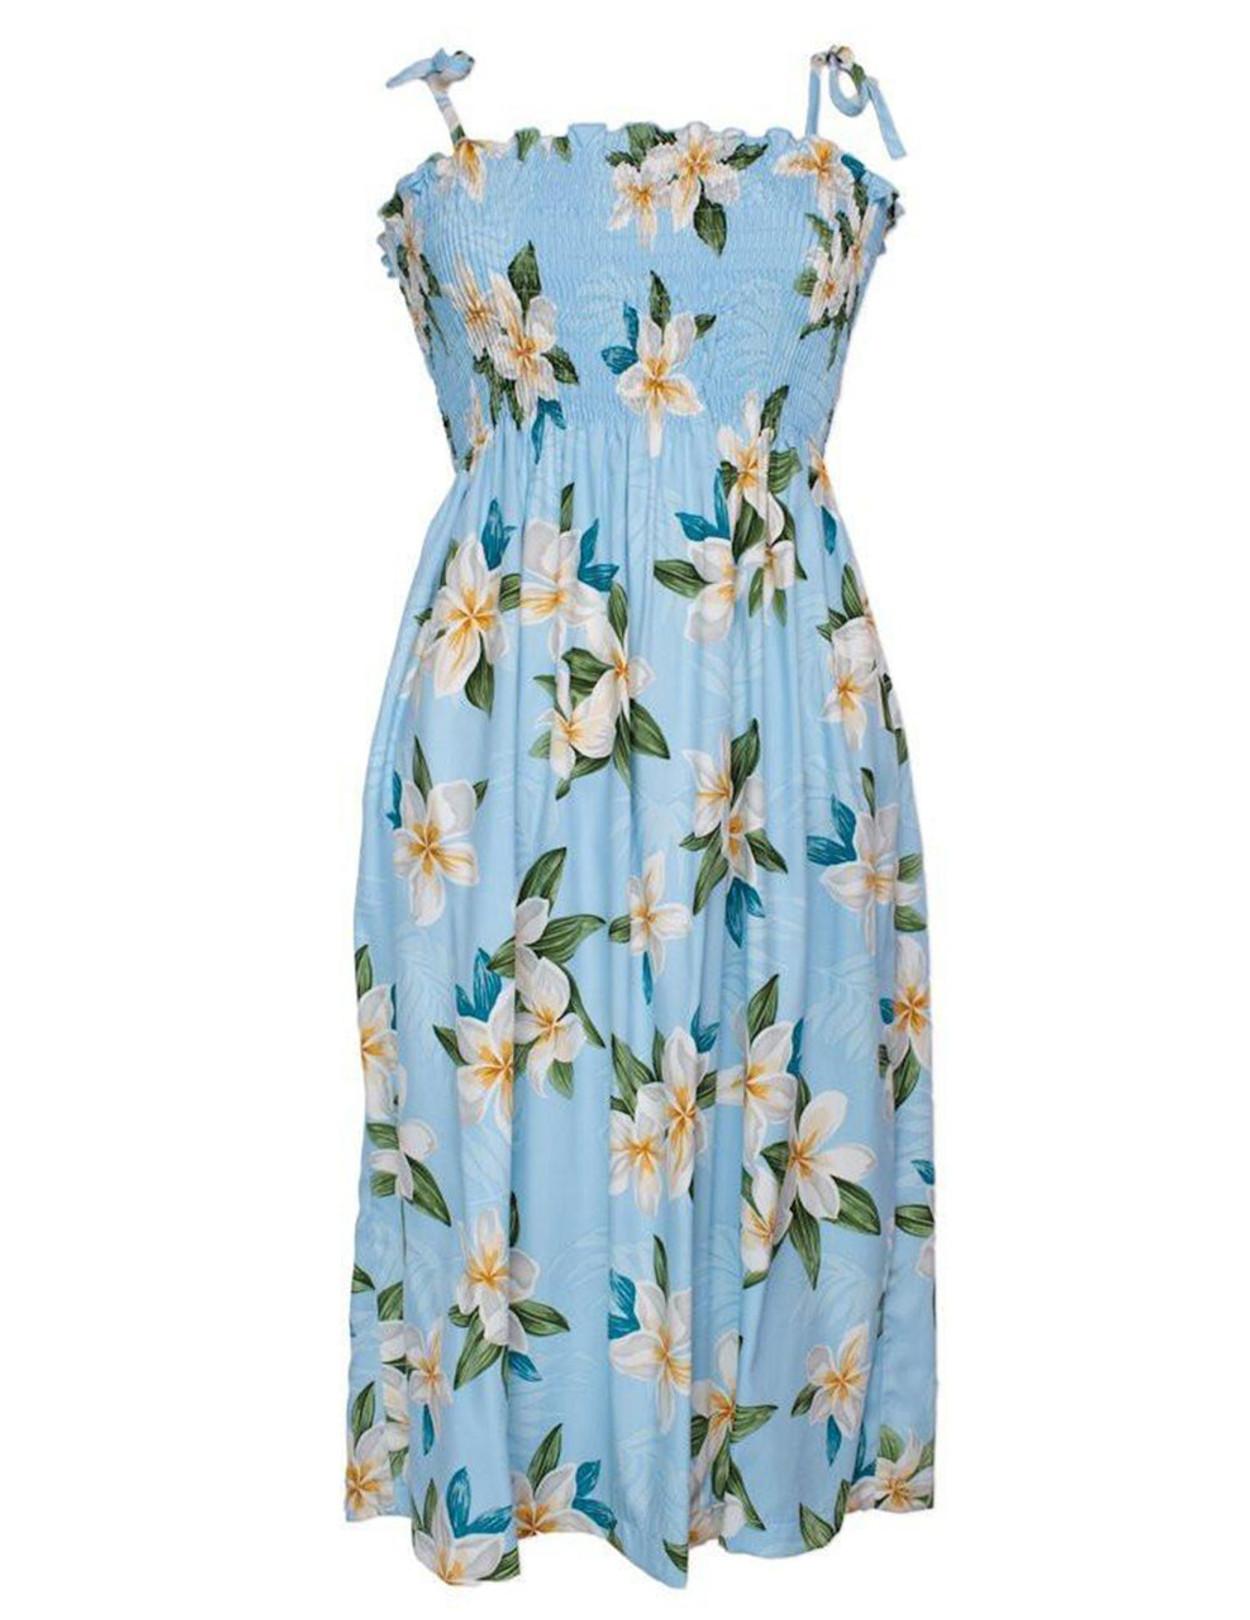 449617cae45b Smocked Dress Plumeria Sky 100% Rayon Fabric Smocked Tube Top Design Tie On  Shoulder or